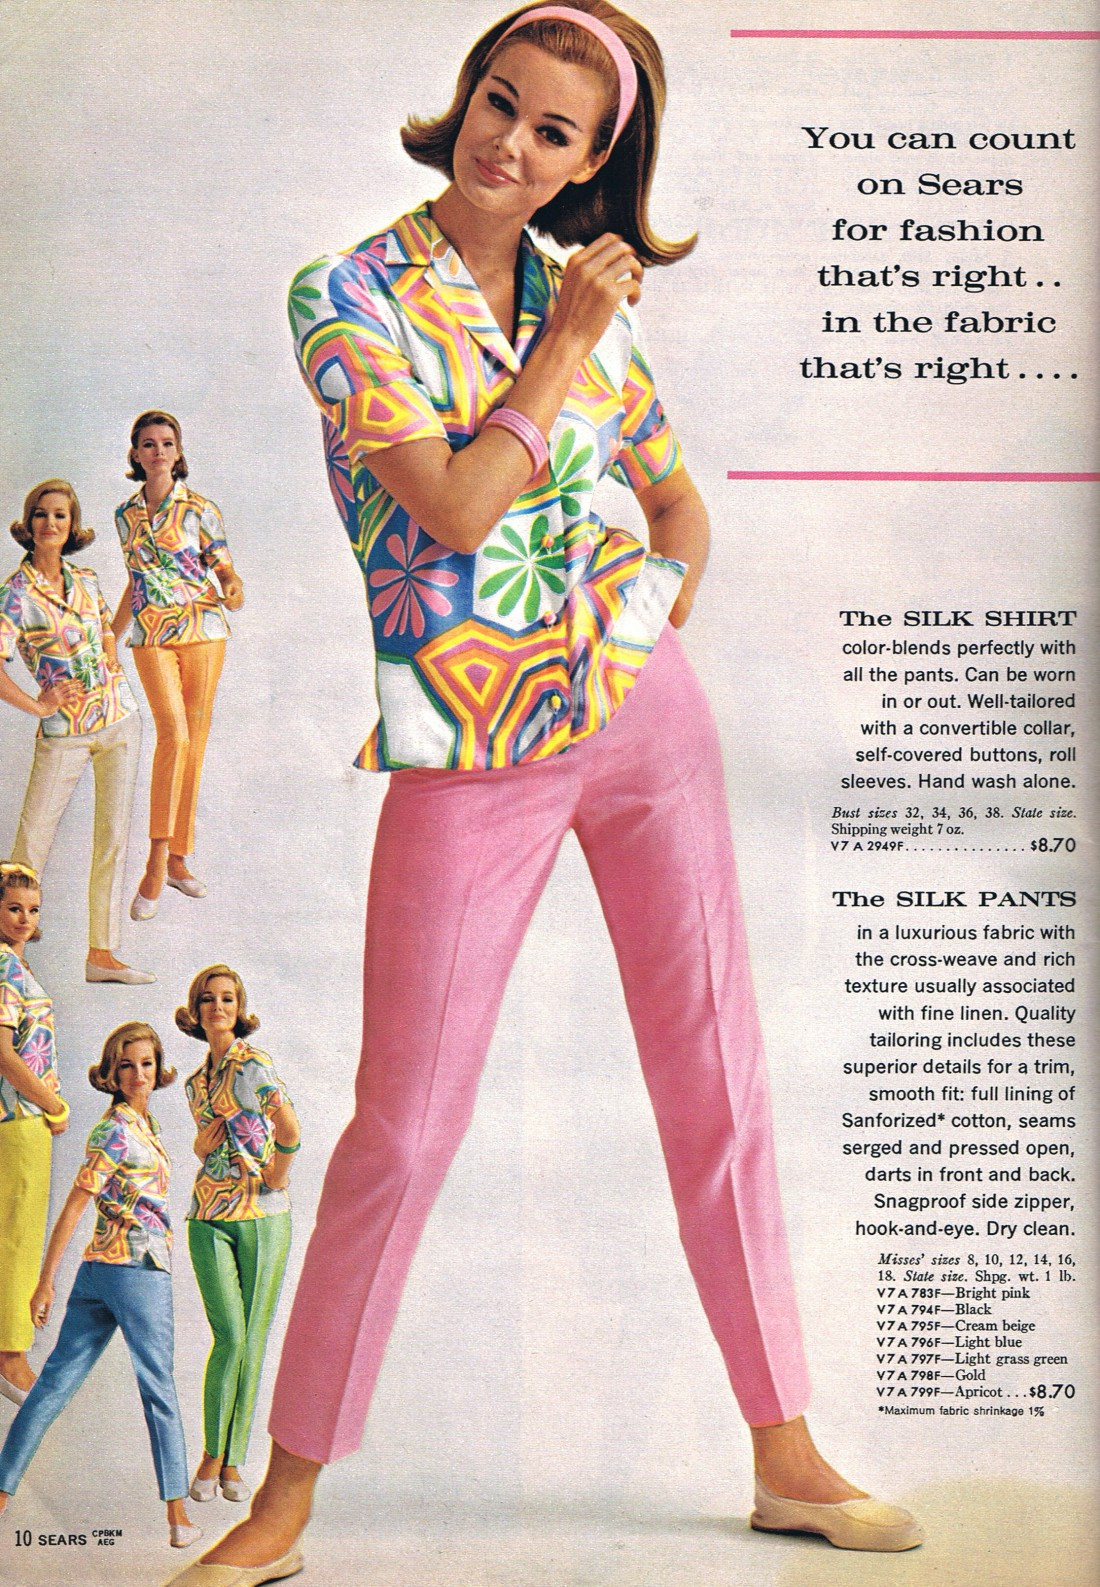 еклама одежды в журнале Sears (1963)